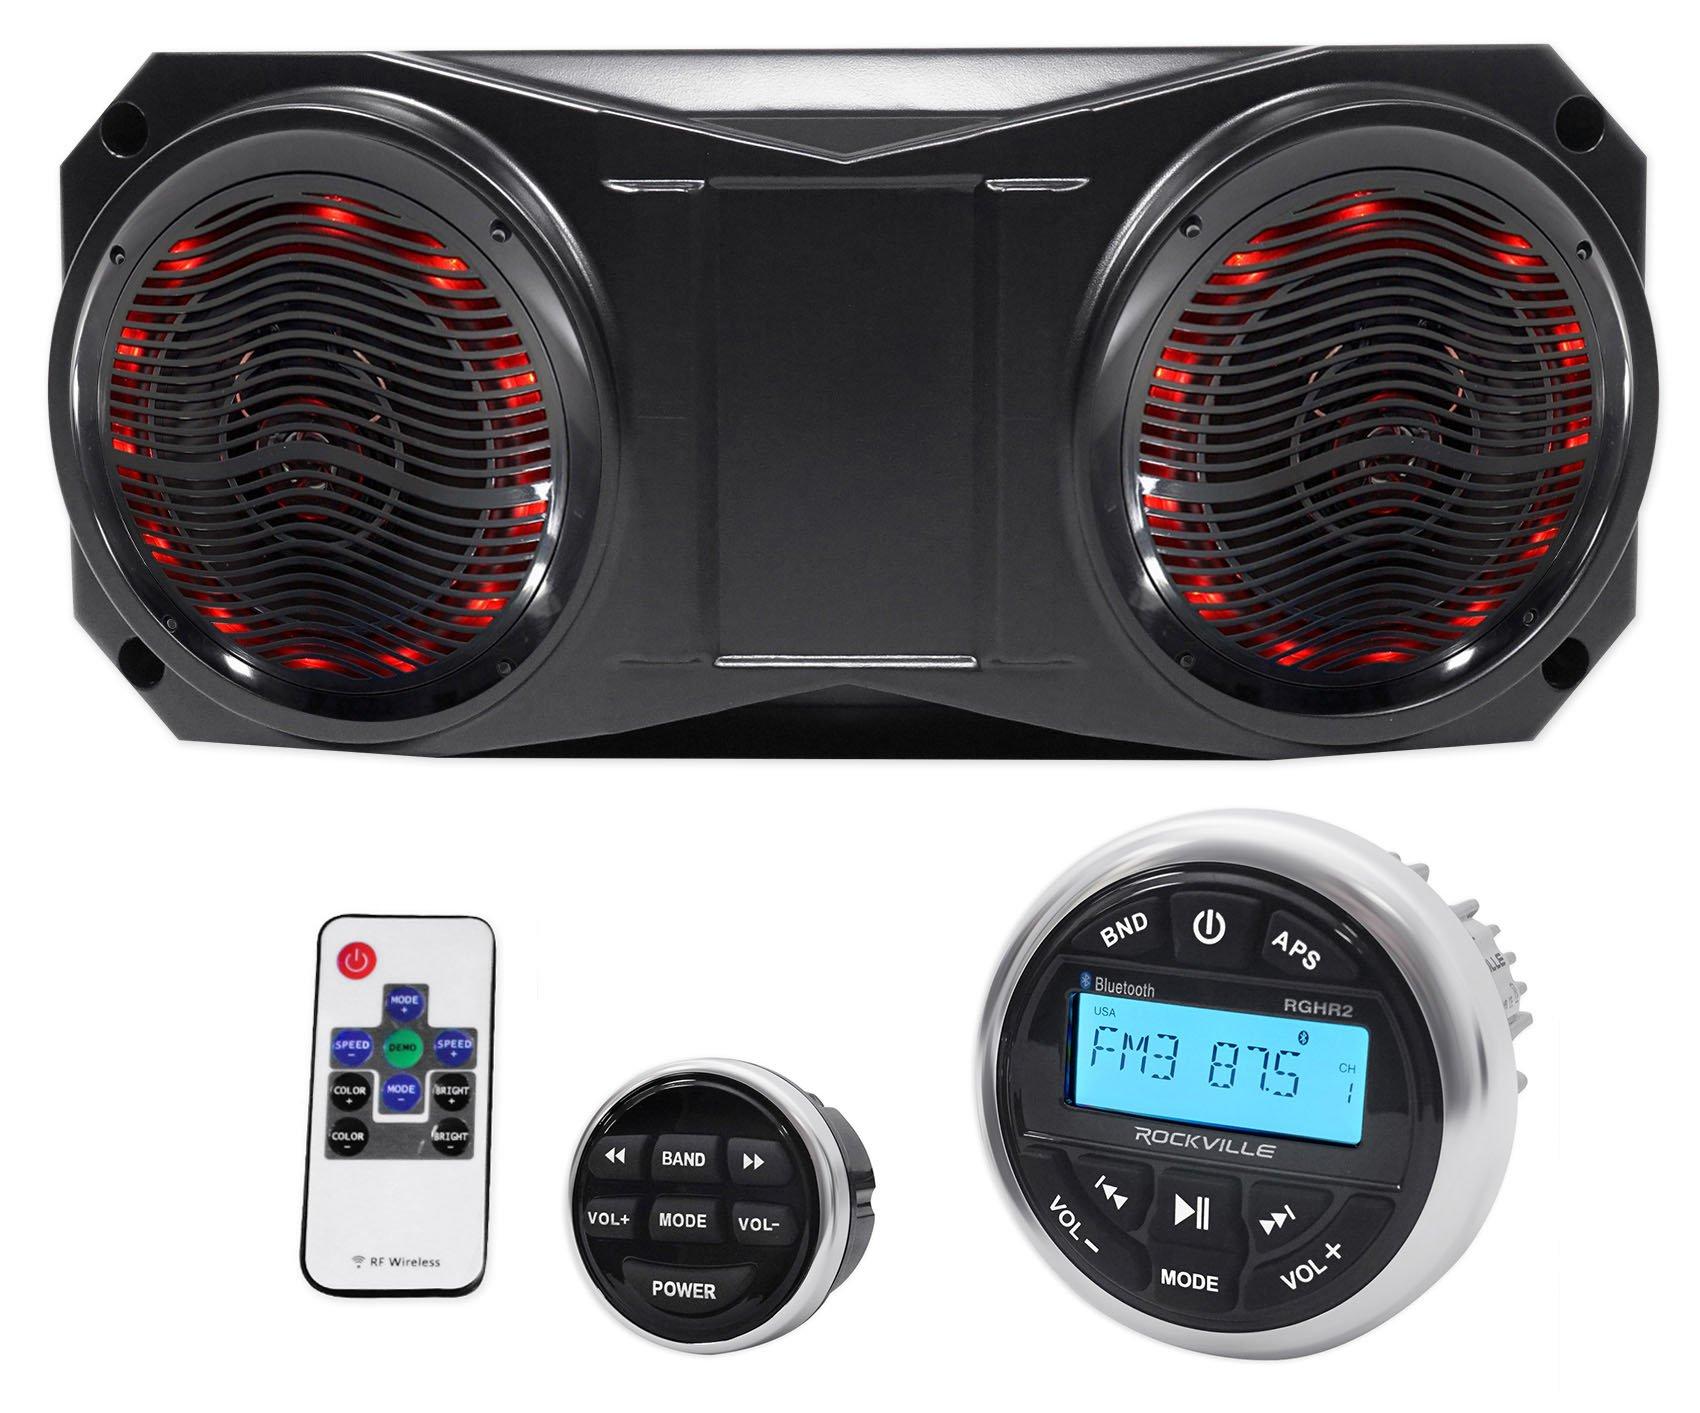 Rockville Bluetooth Gauge Receiver+(2) 6.5'' Overhead LED Speakers 4 ATV/UTV/Cart